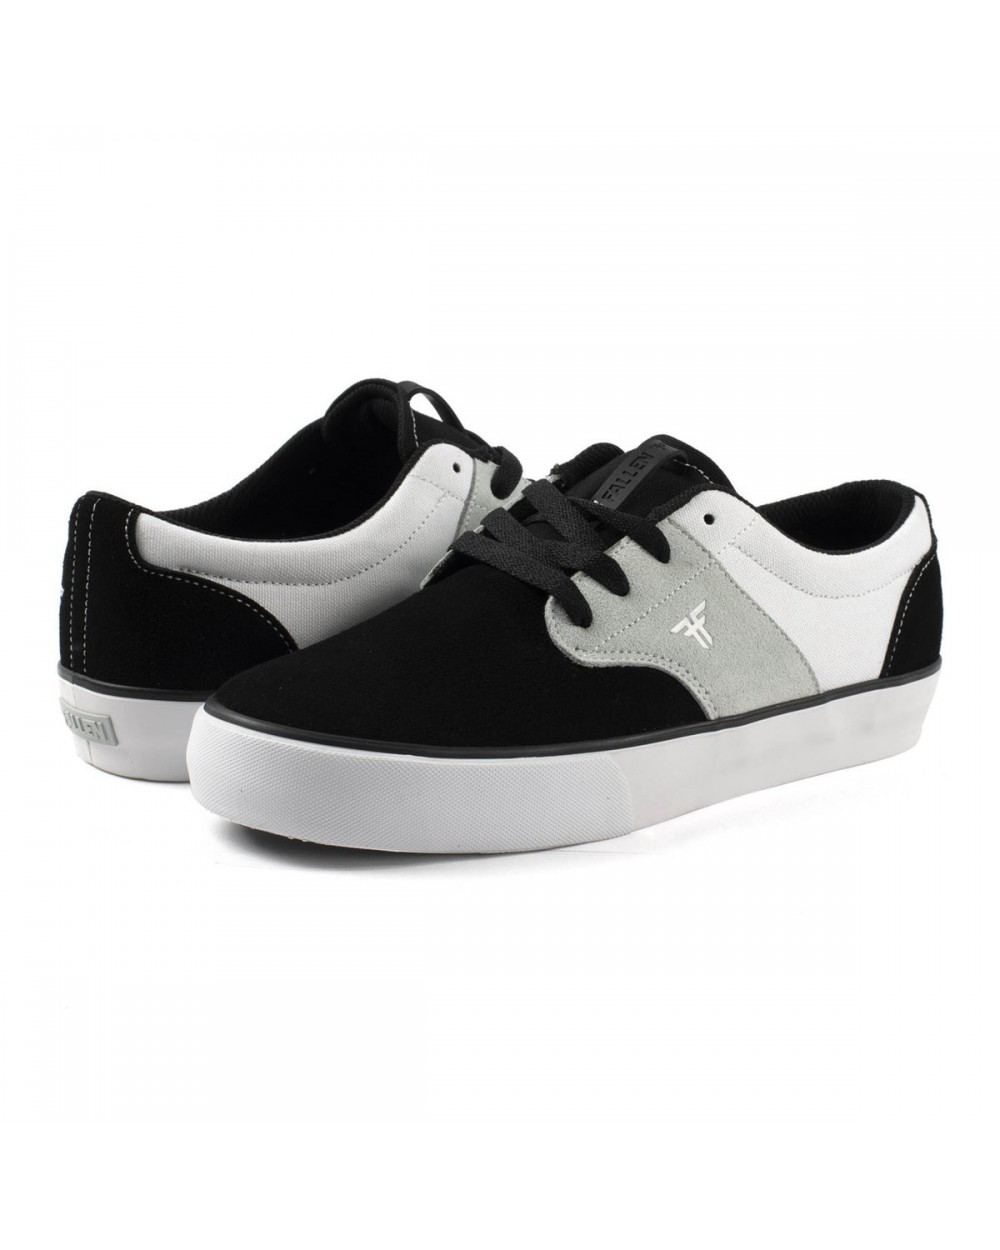 Fallen Phoenix Shoe - Black / Natural White